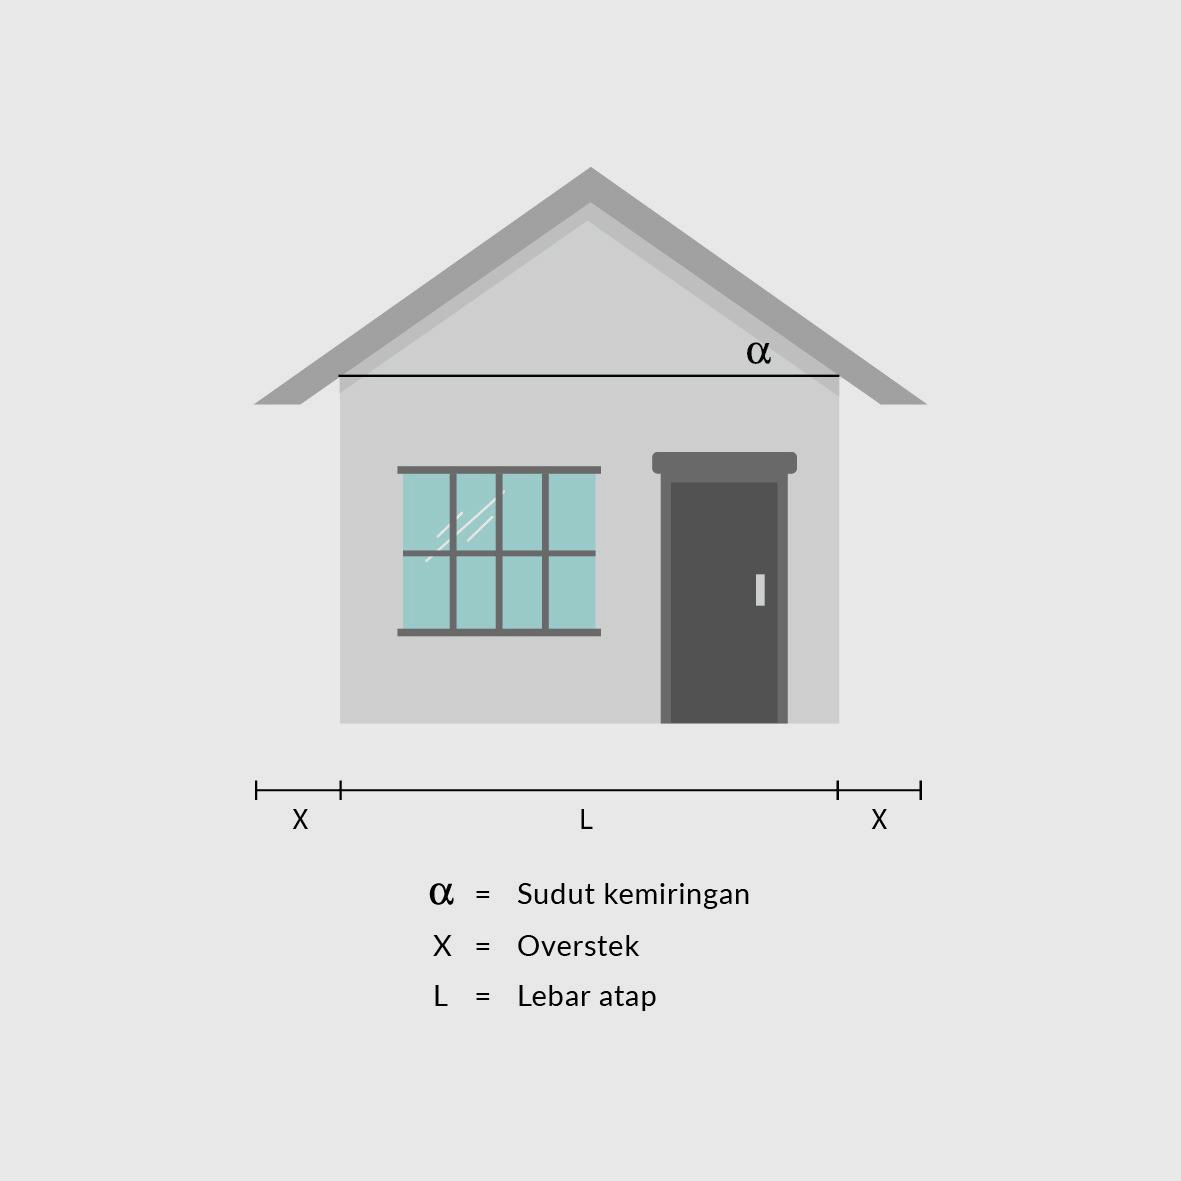 Gambar keterangan kalkulator 2